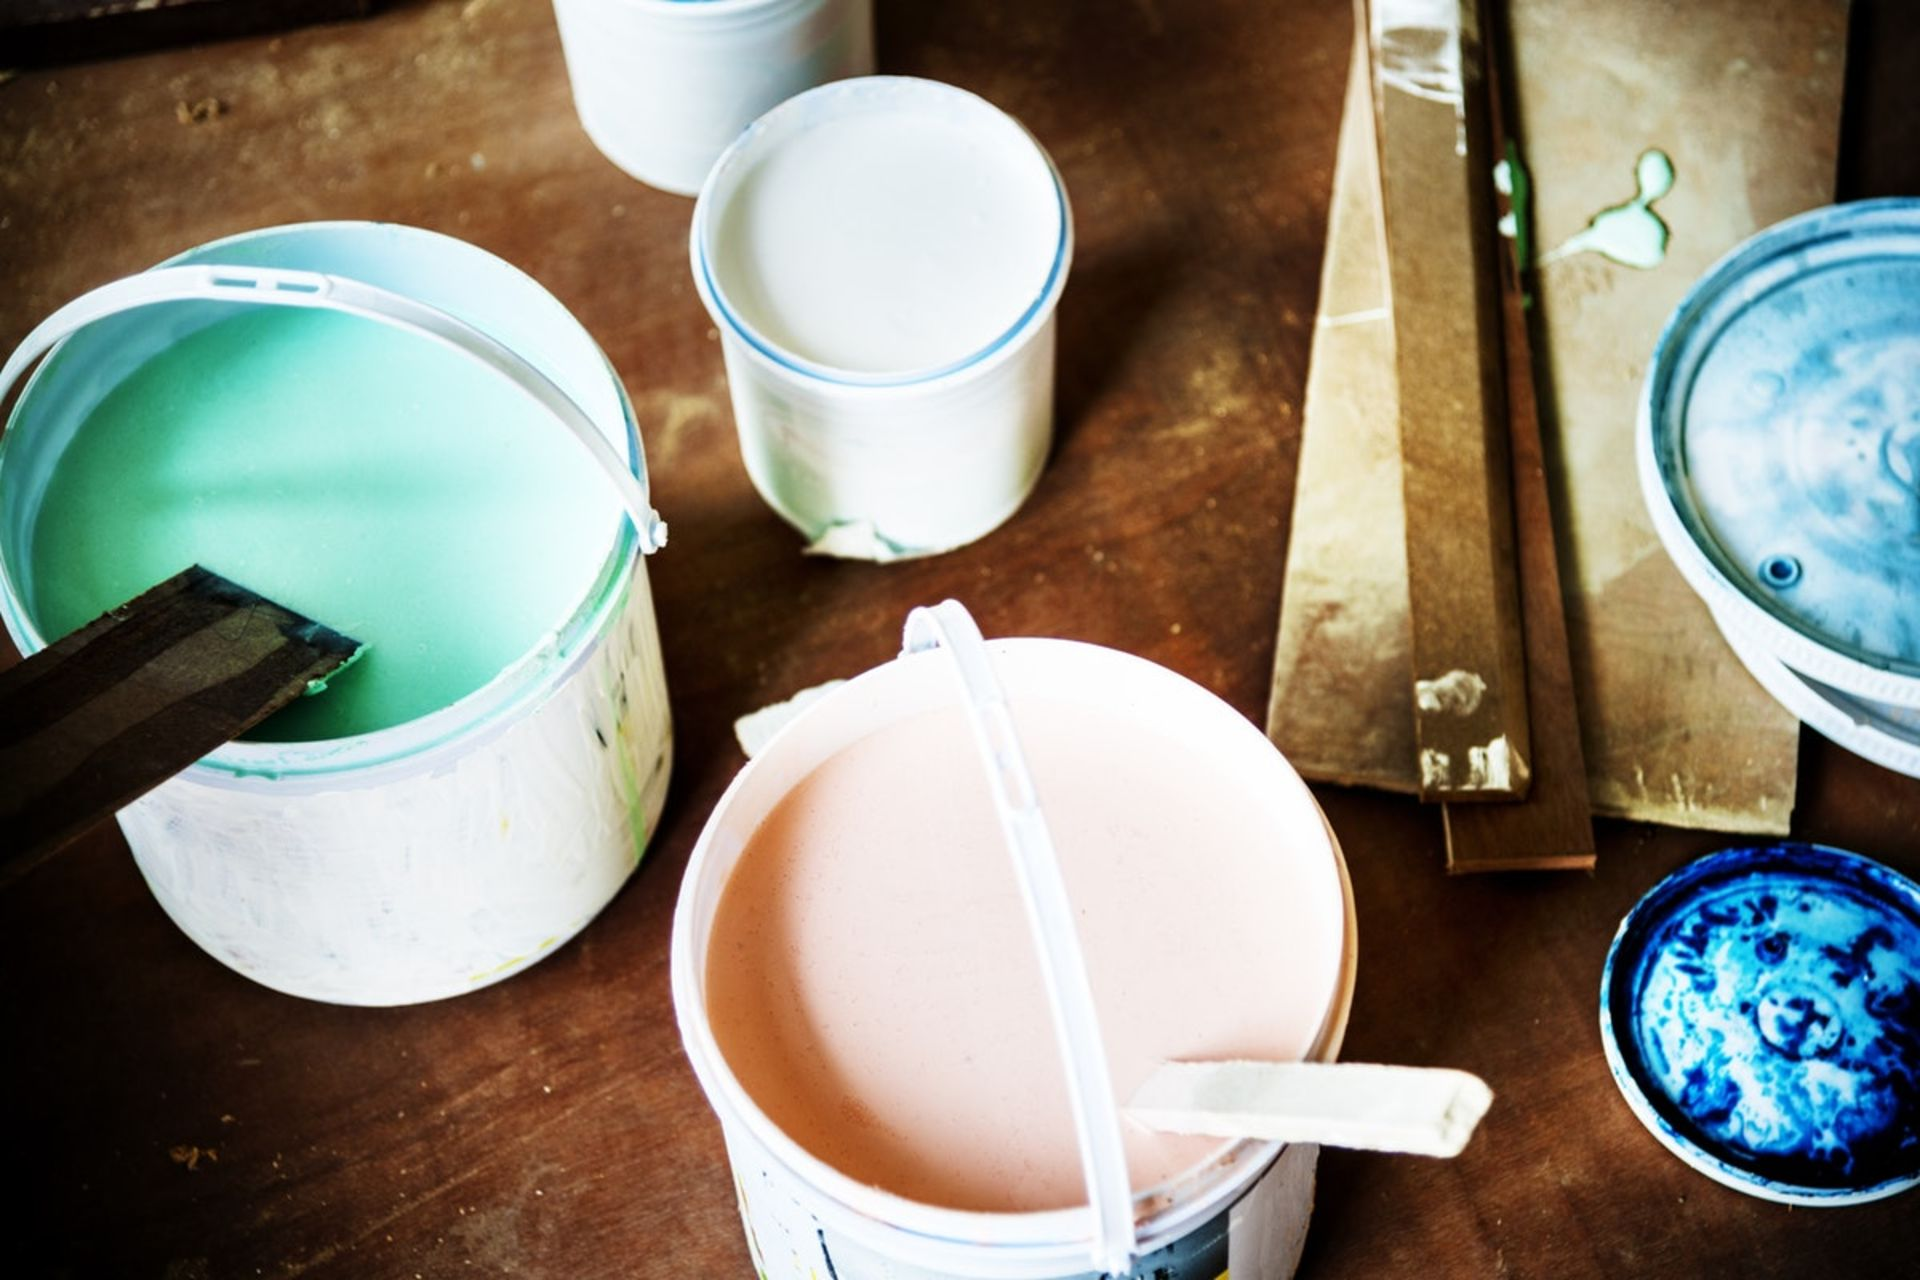 7 Essentials of Choosing a Paint Color